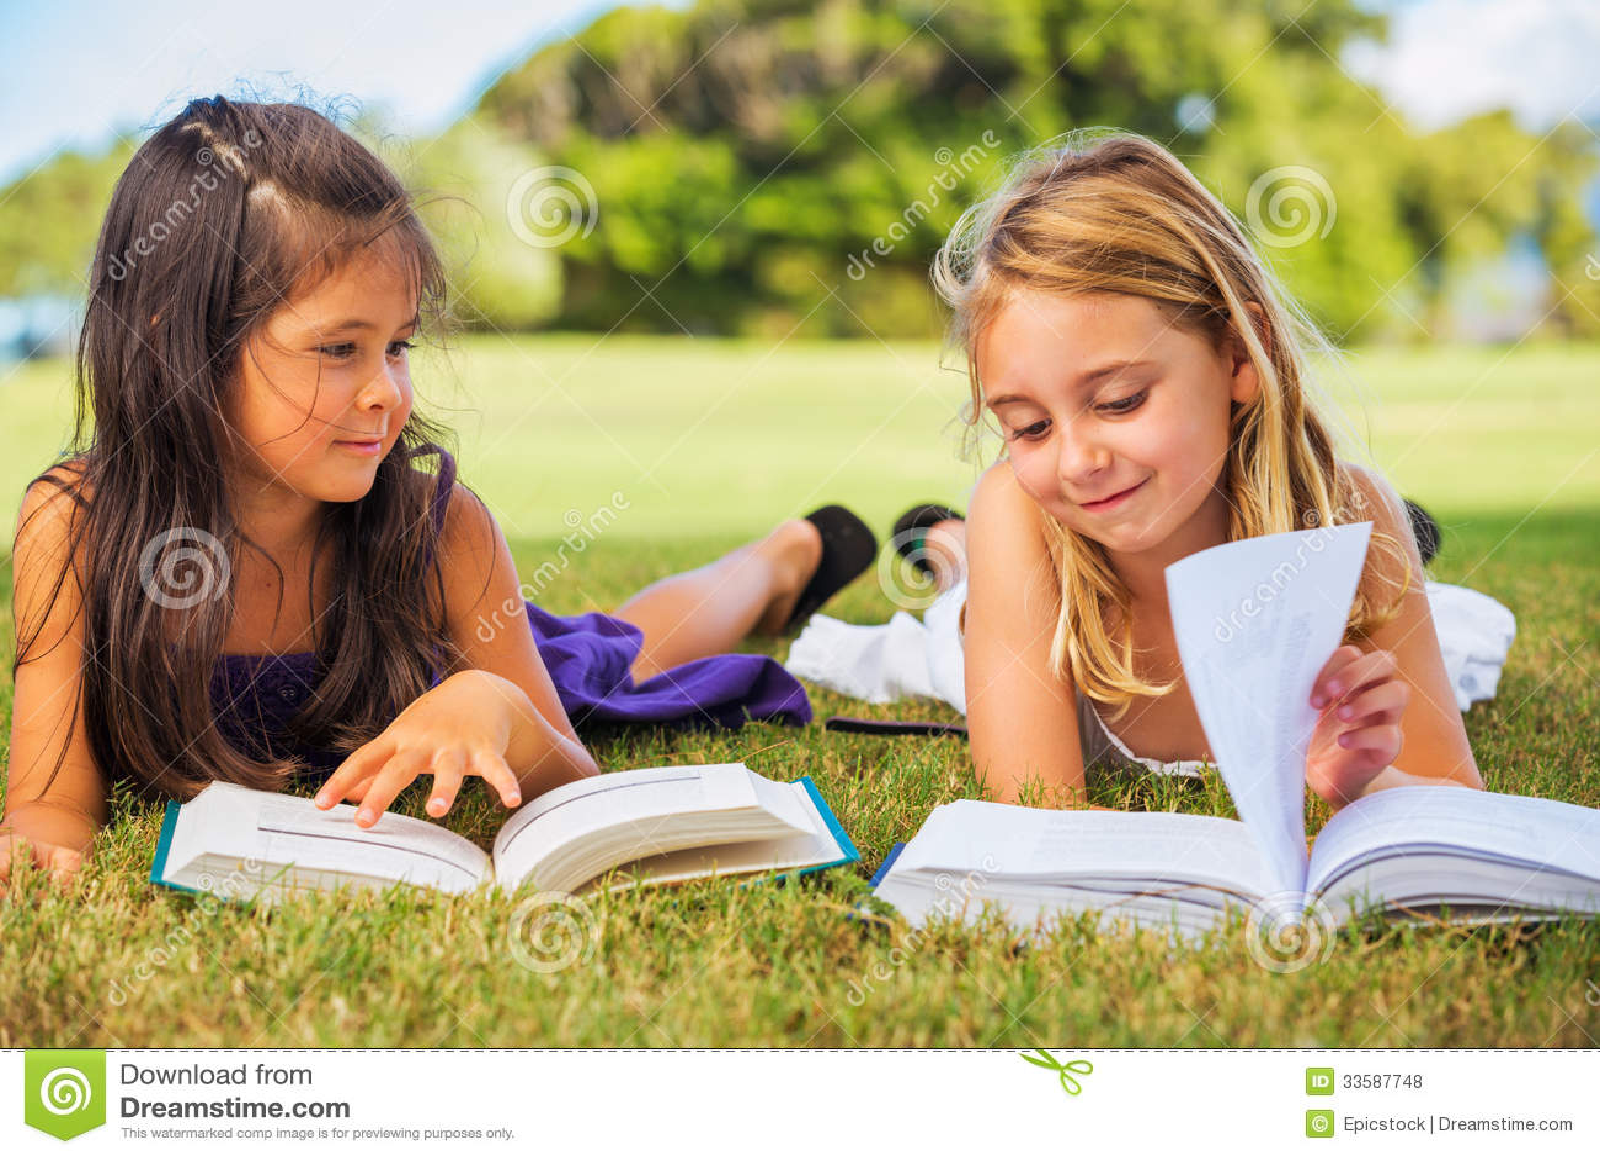 Kids Reading Books Royalty Free Stock Photos Image 33587748